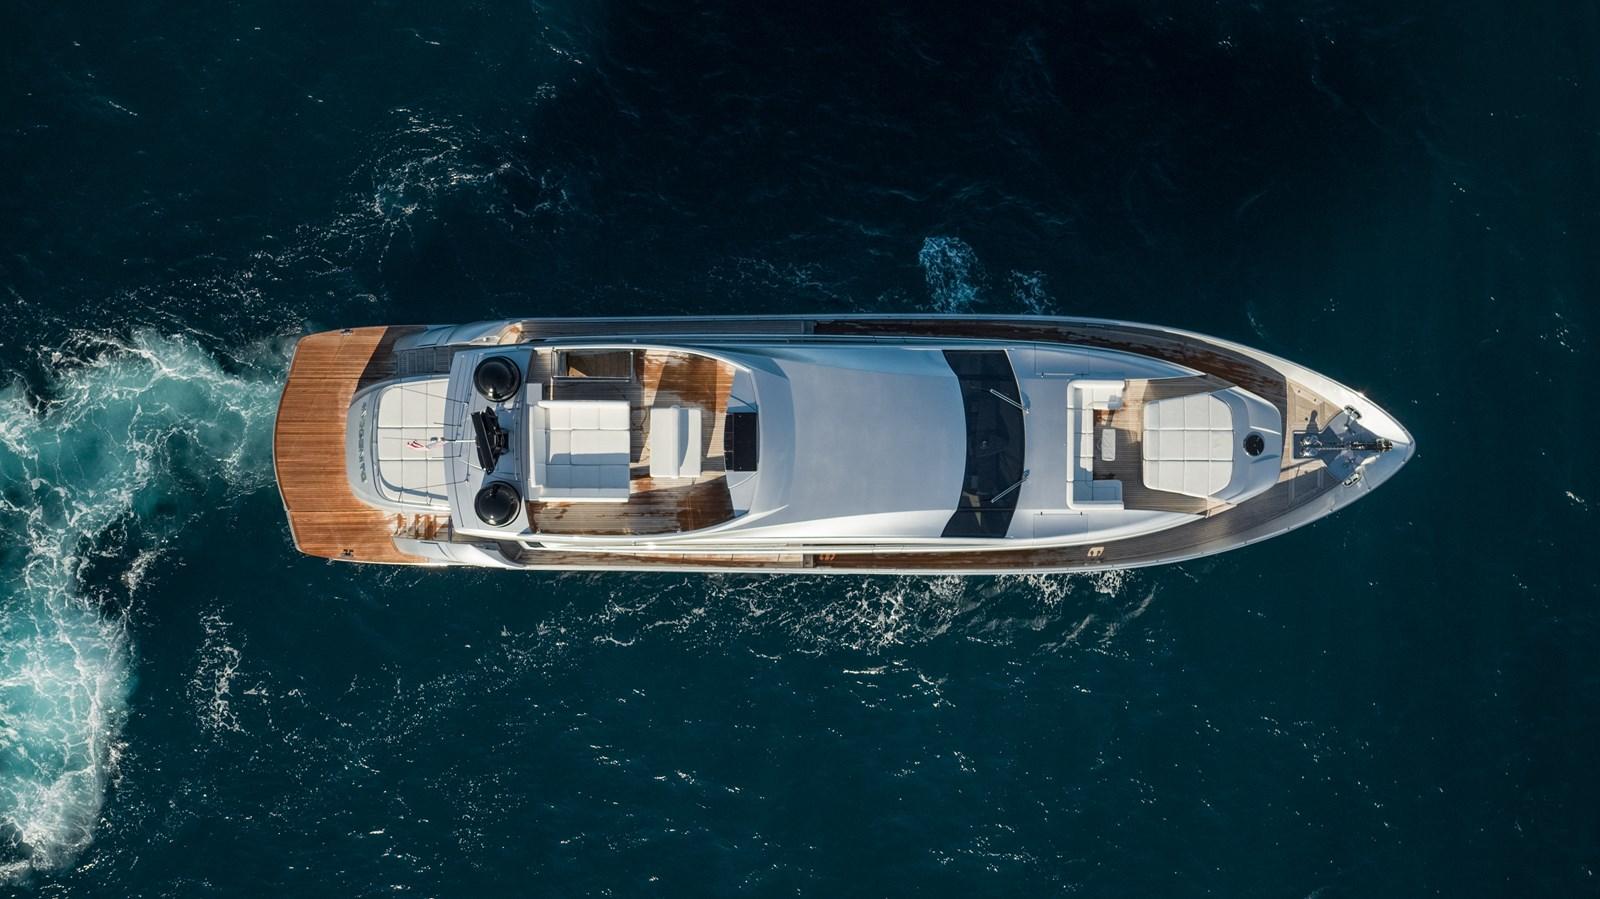 DJI_0021 2012 PERSHING  Motor Yacht 2810227